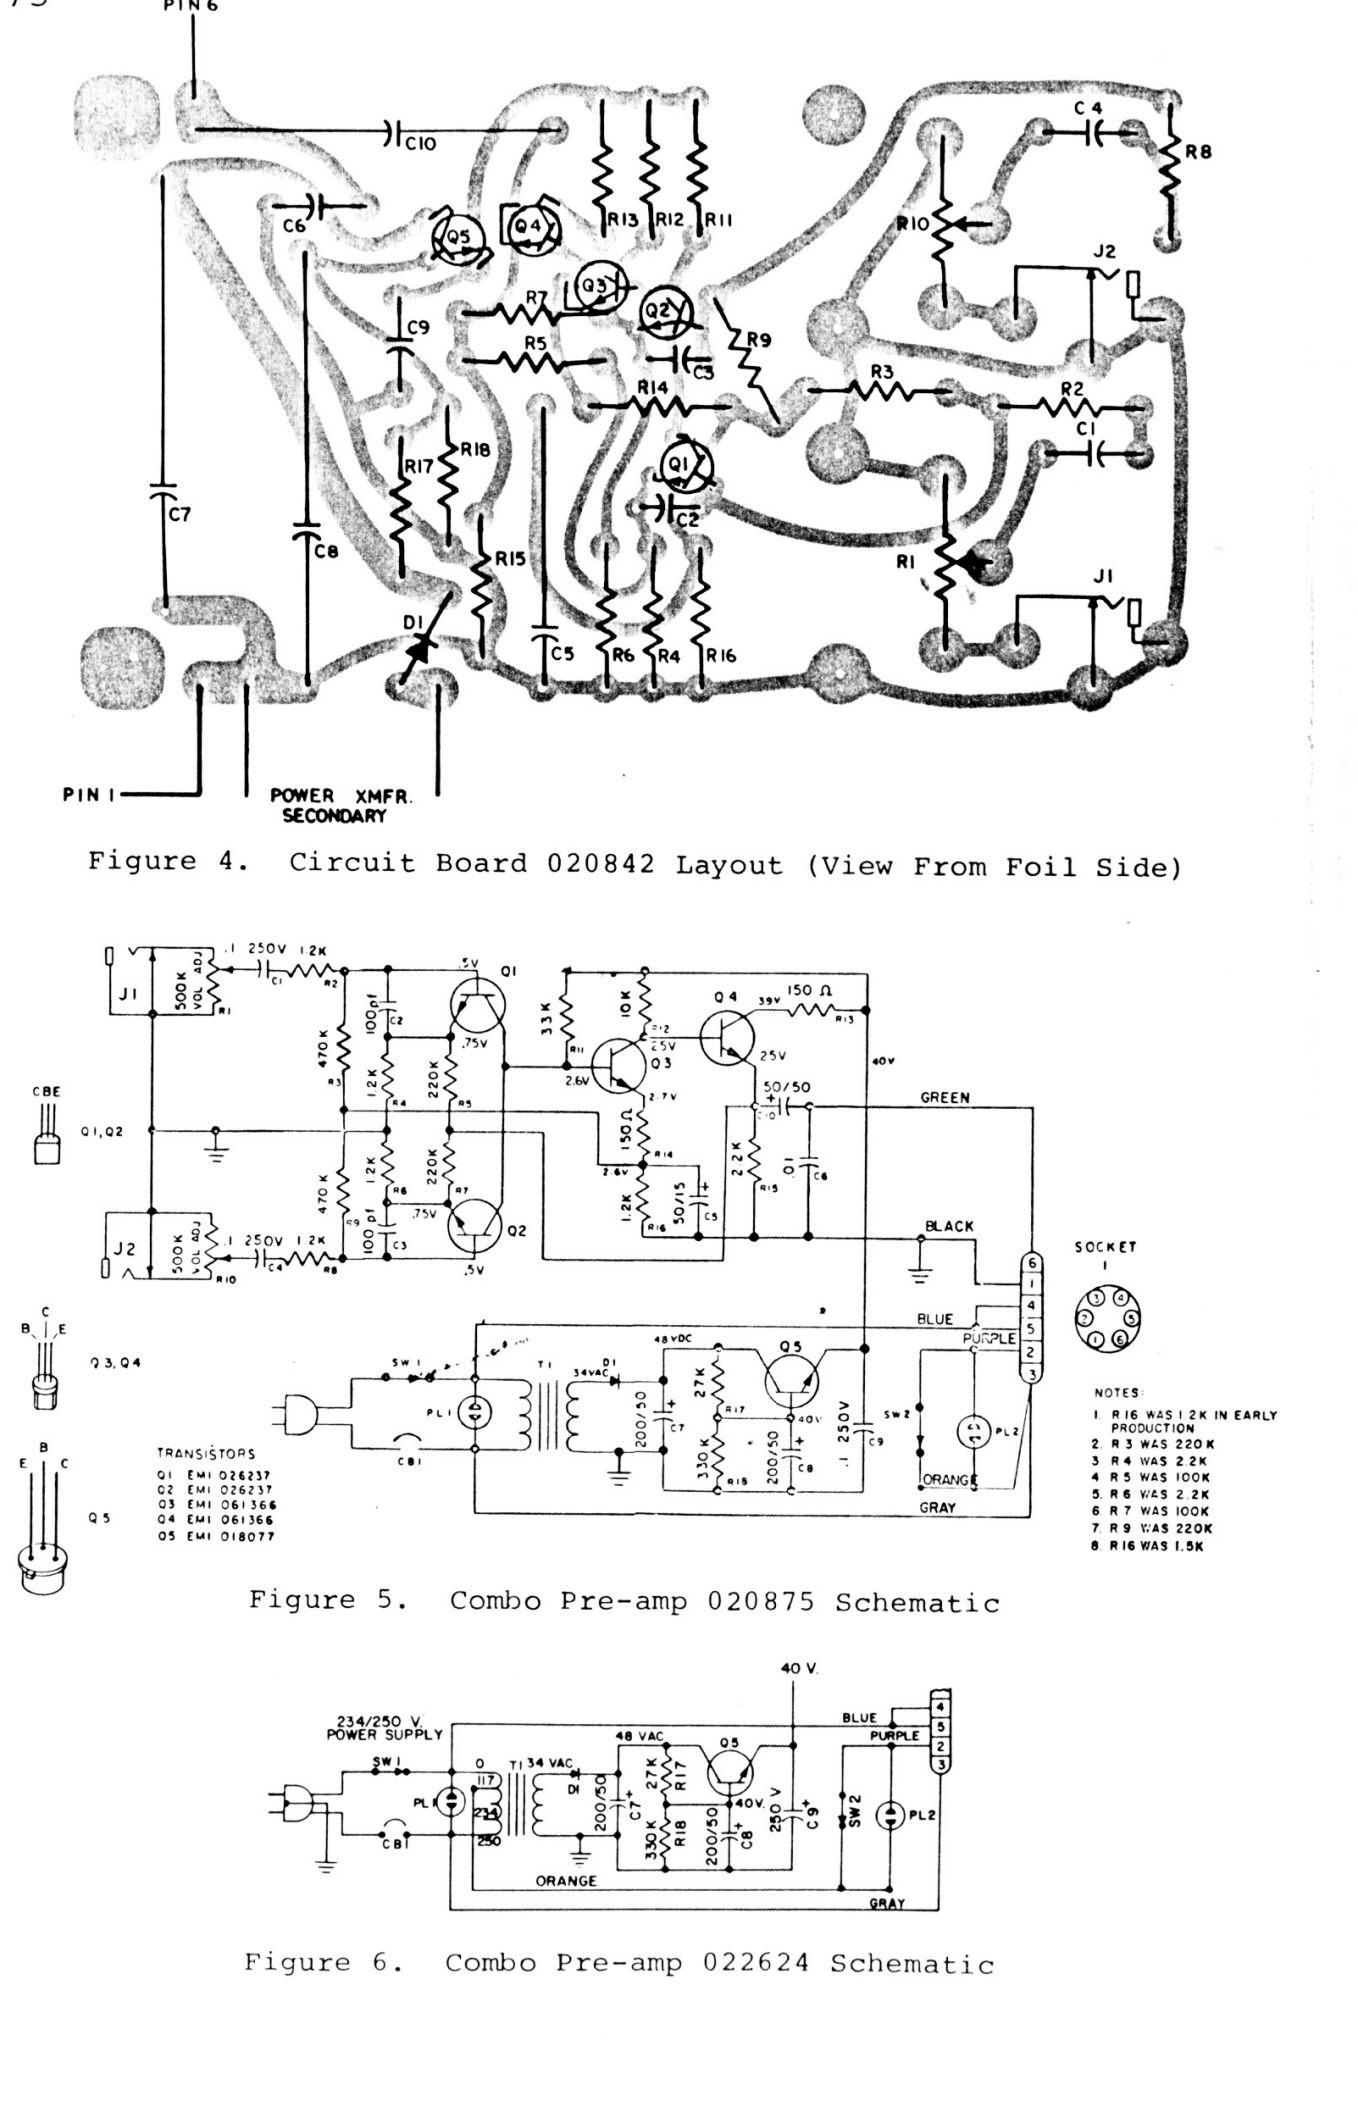 Leslie Combo Pre-amp Image   397728